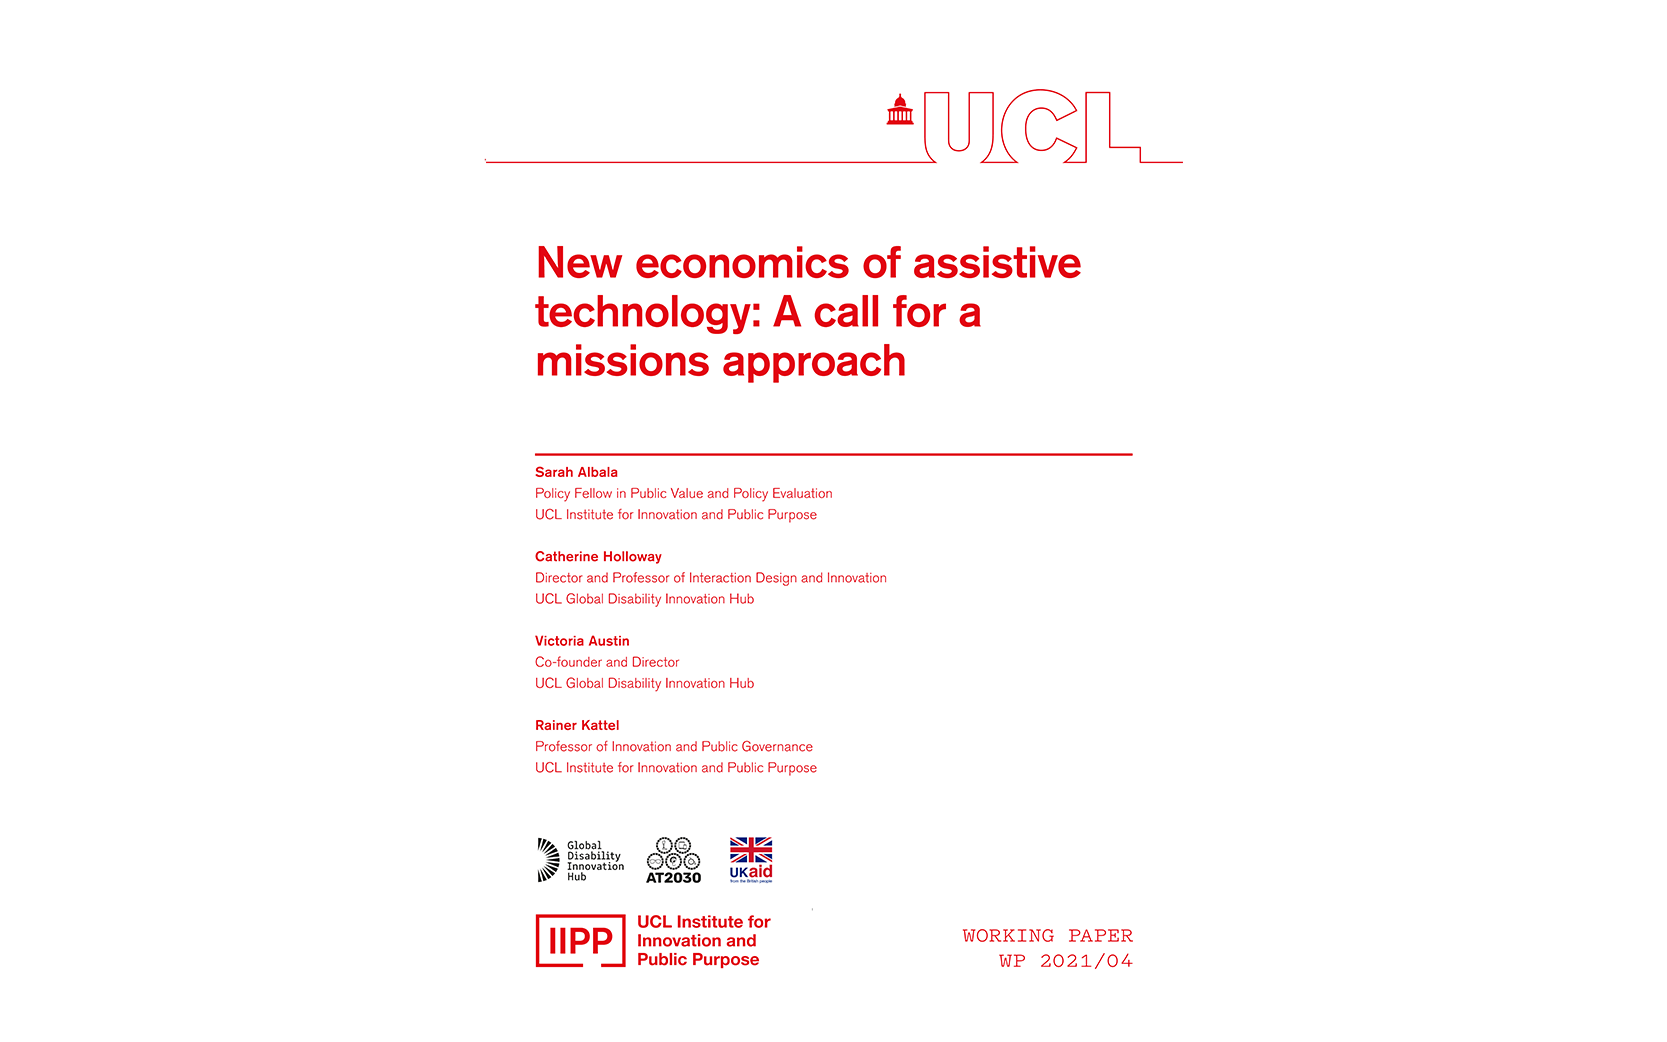 iipp-publications-new-economics-of-assistive-technology-wp2021-04-800x500.png